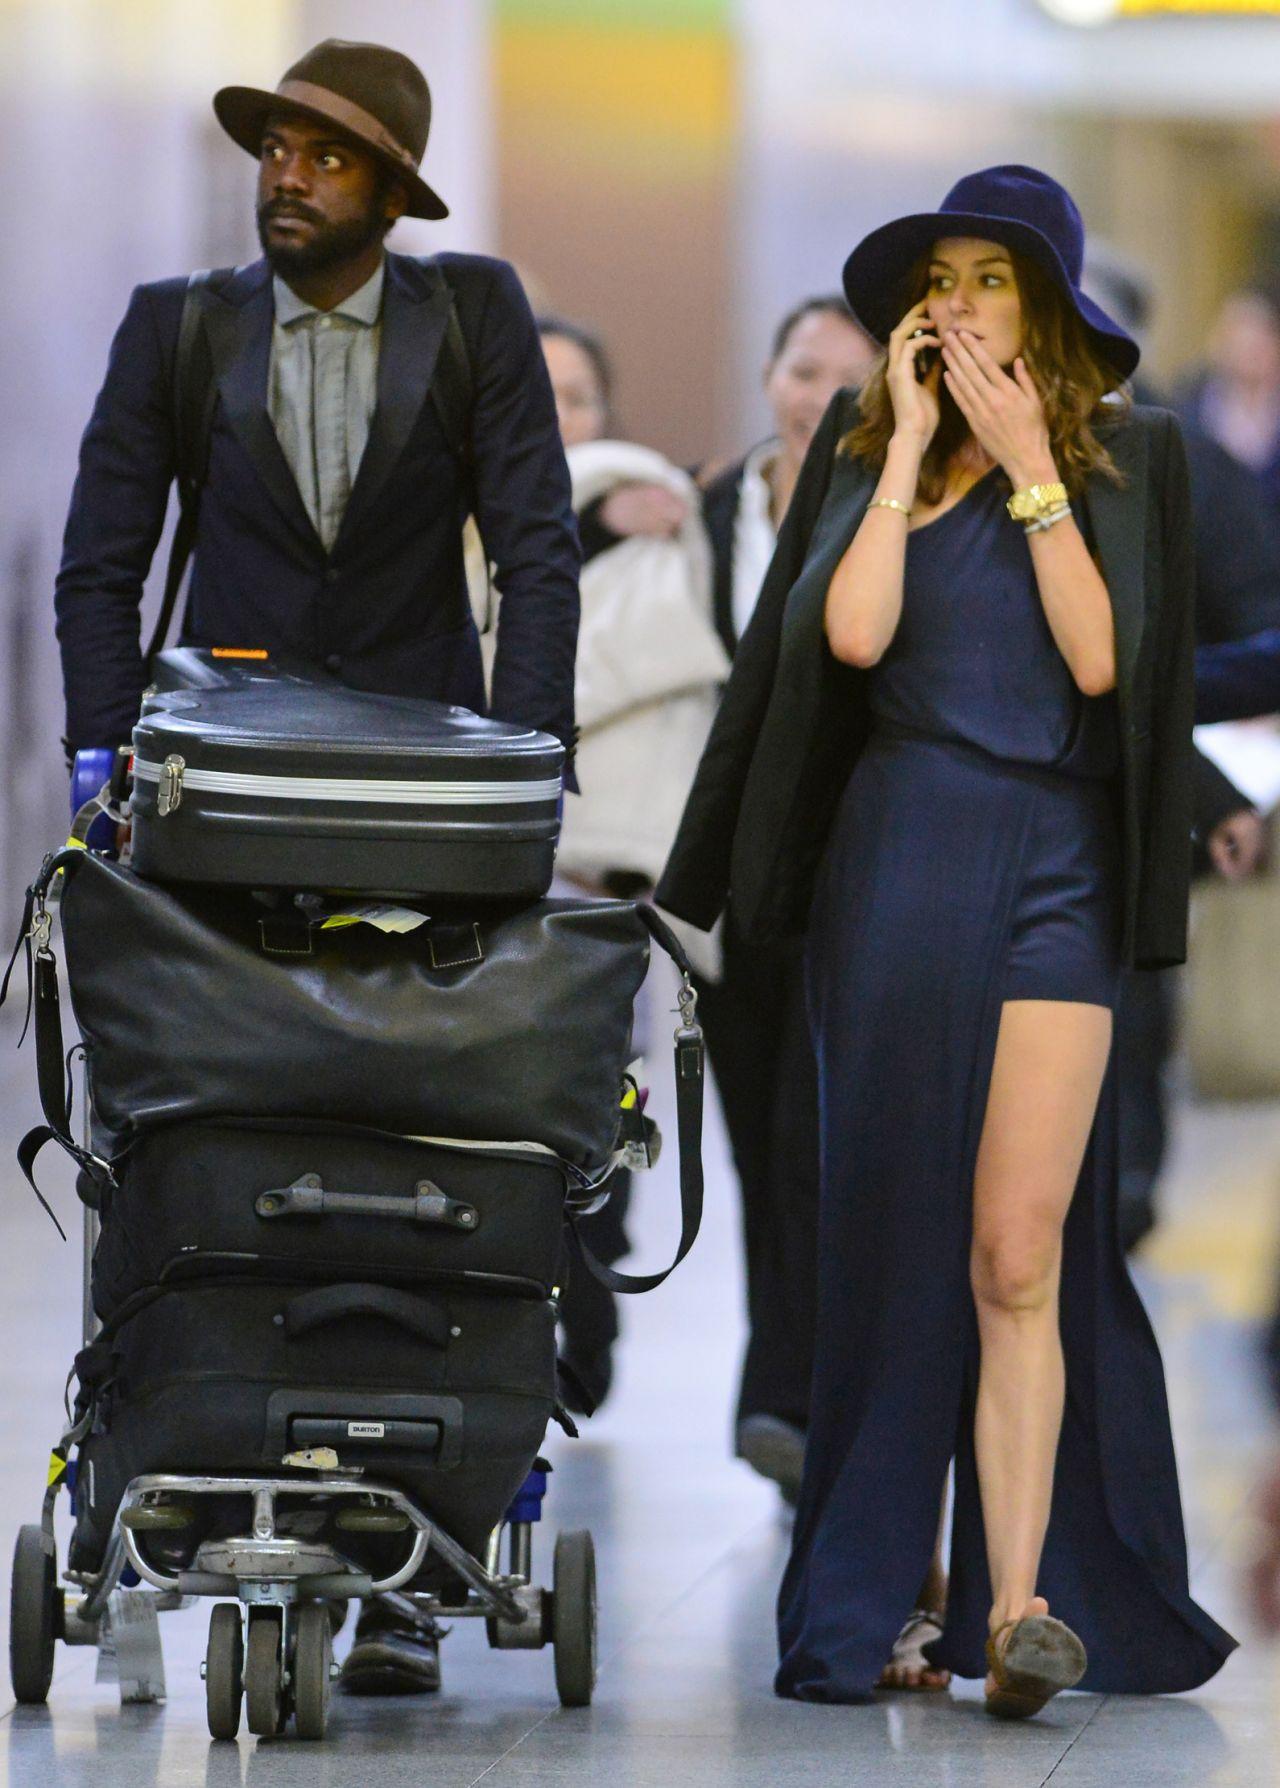 Nicole Trunfio Style Jfk Airport In New York City